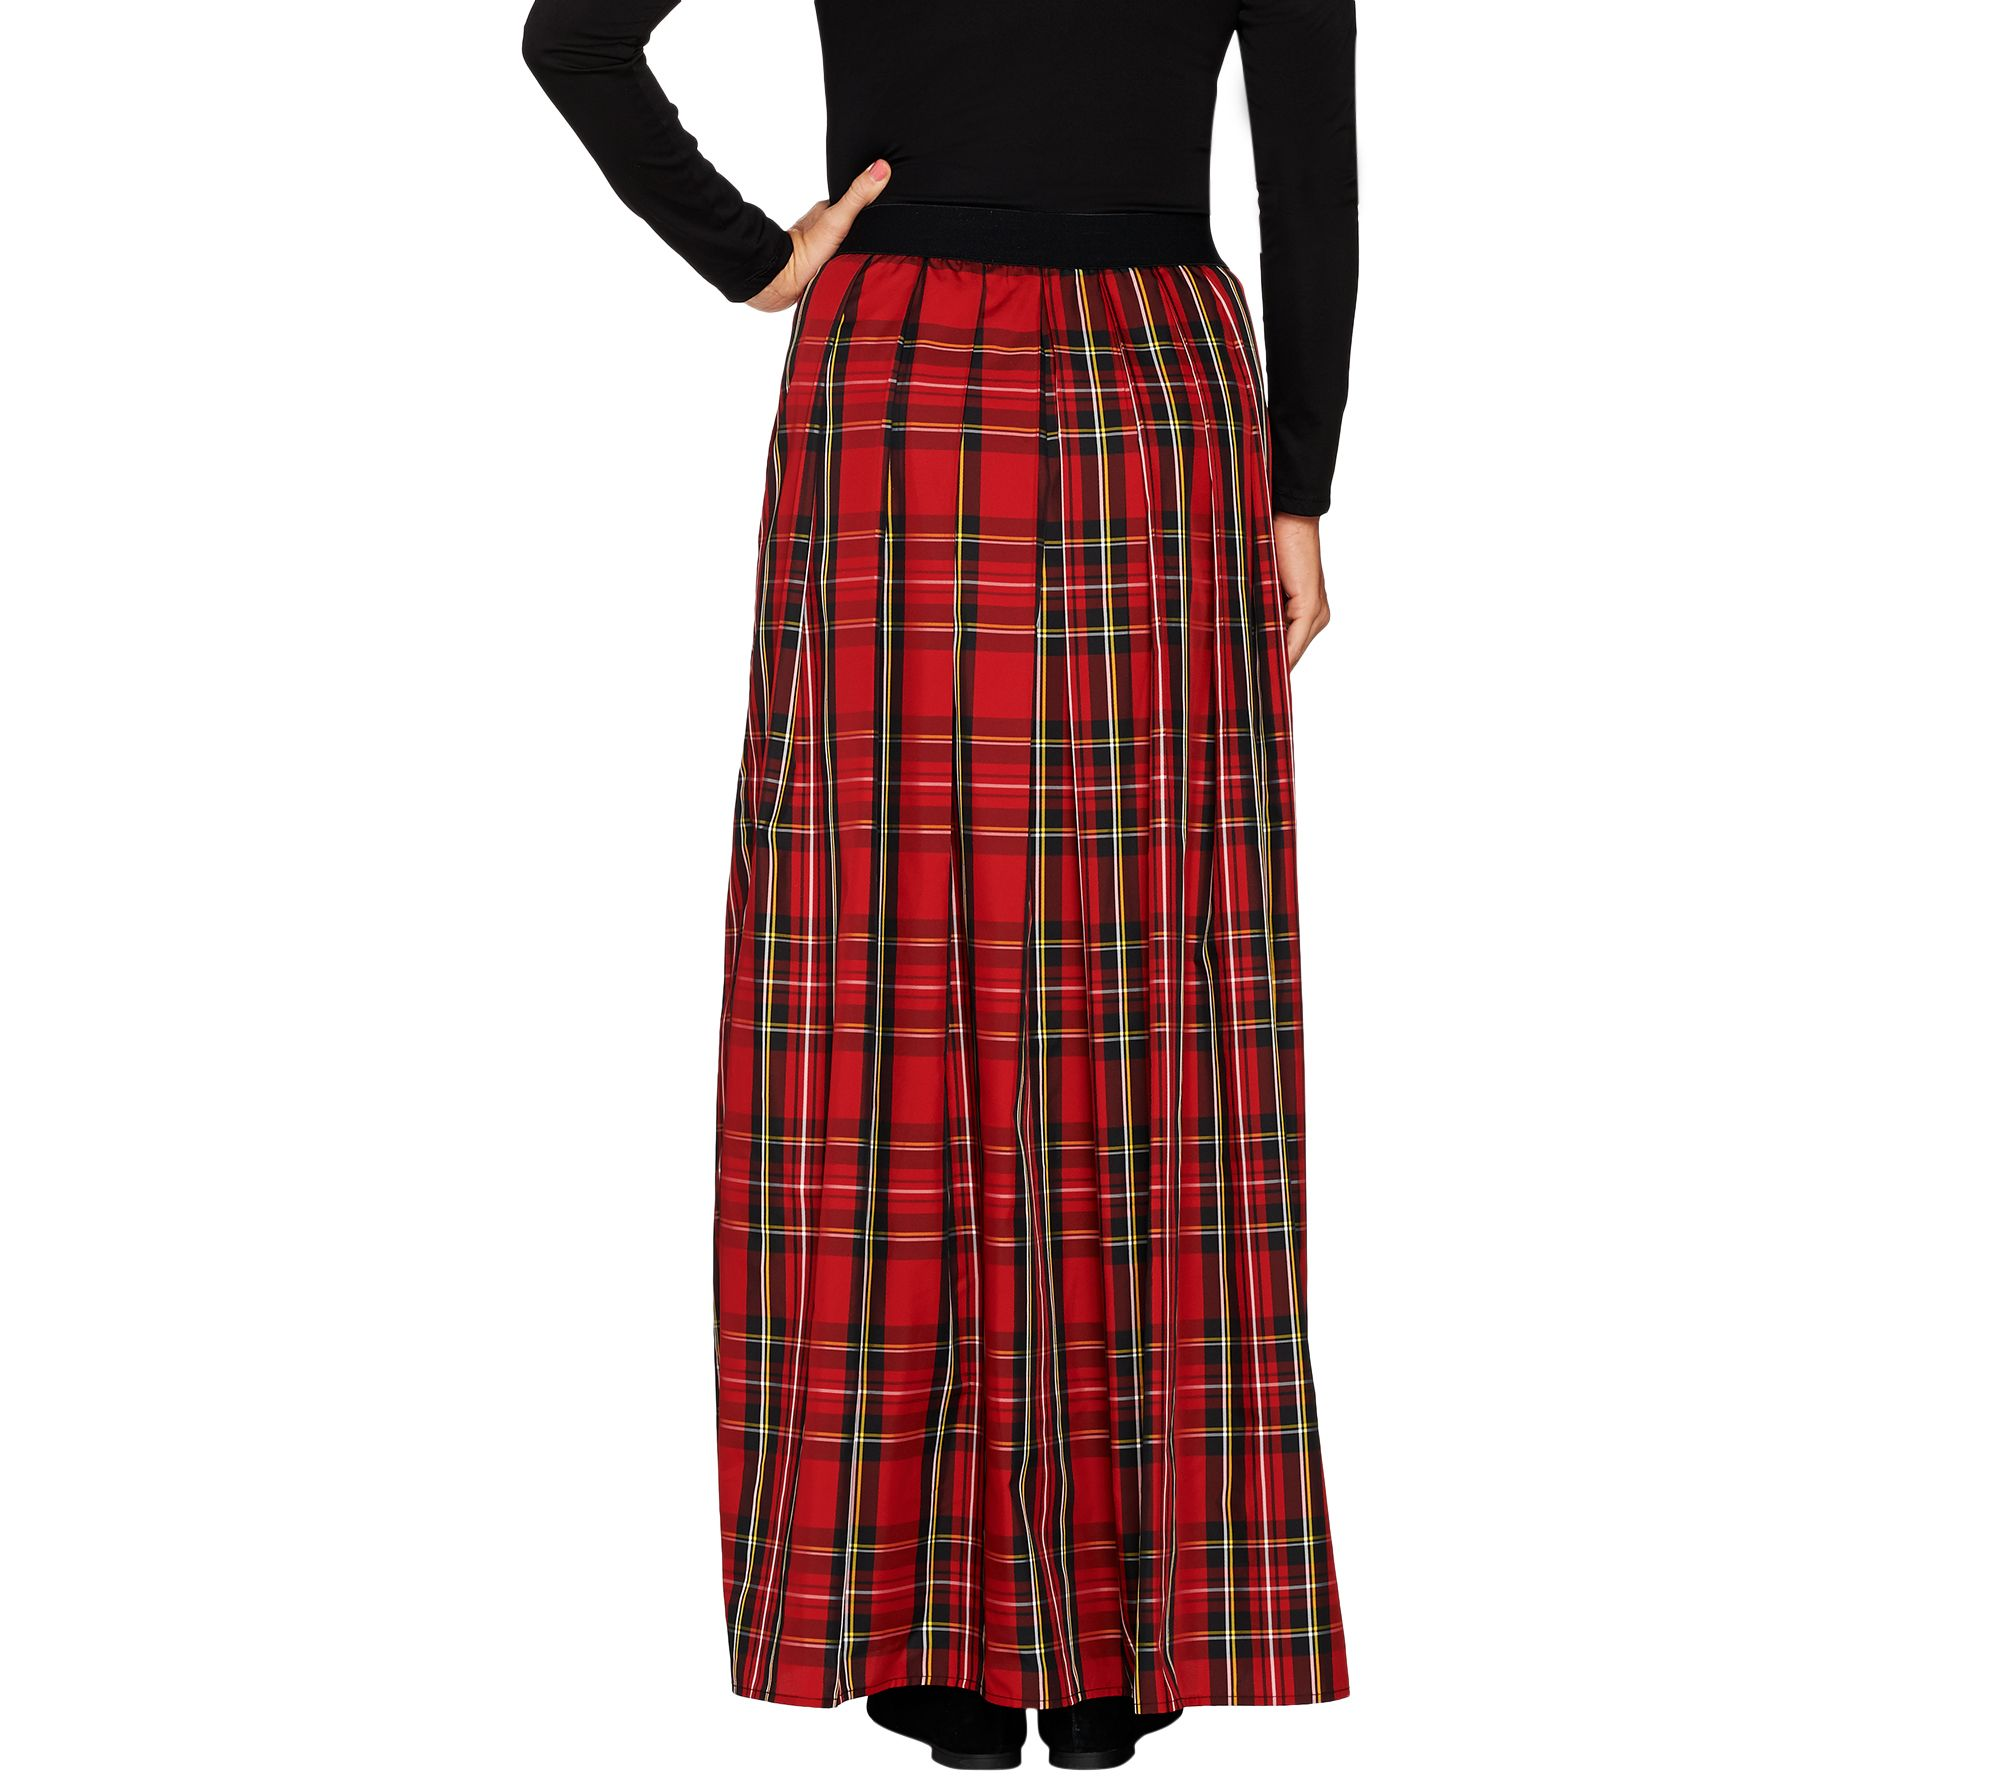 a9fcb591d481d Joan Rivers Regular Length Holiday Plaid Maxi Skirt - Page 1 — QVC.com